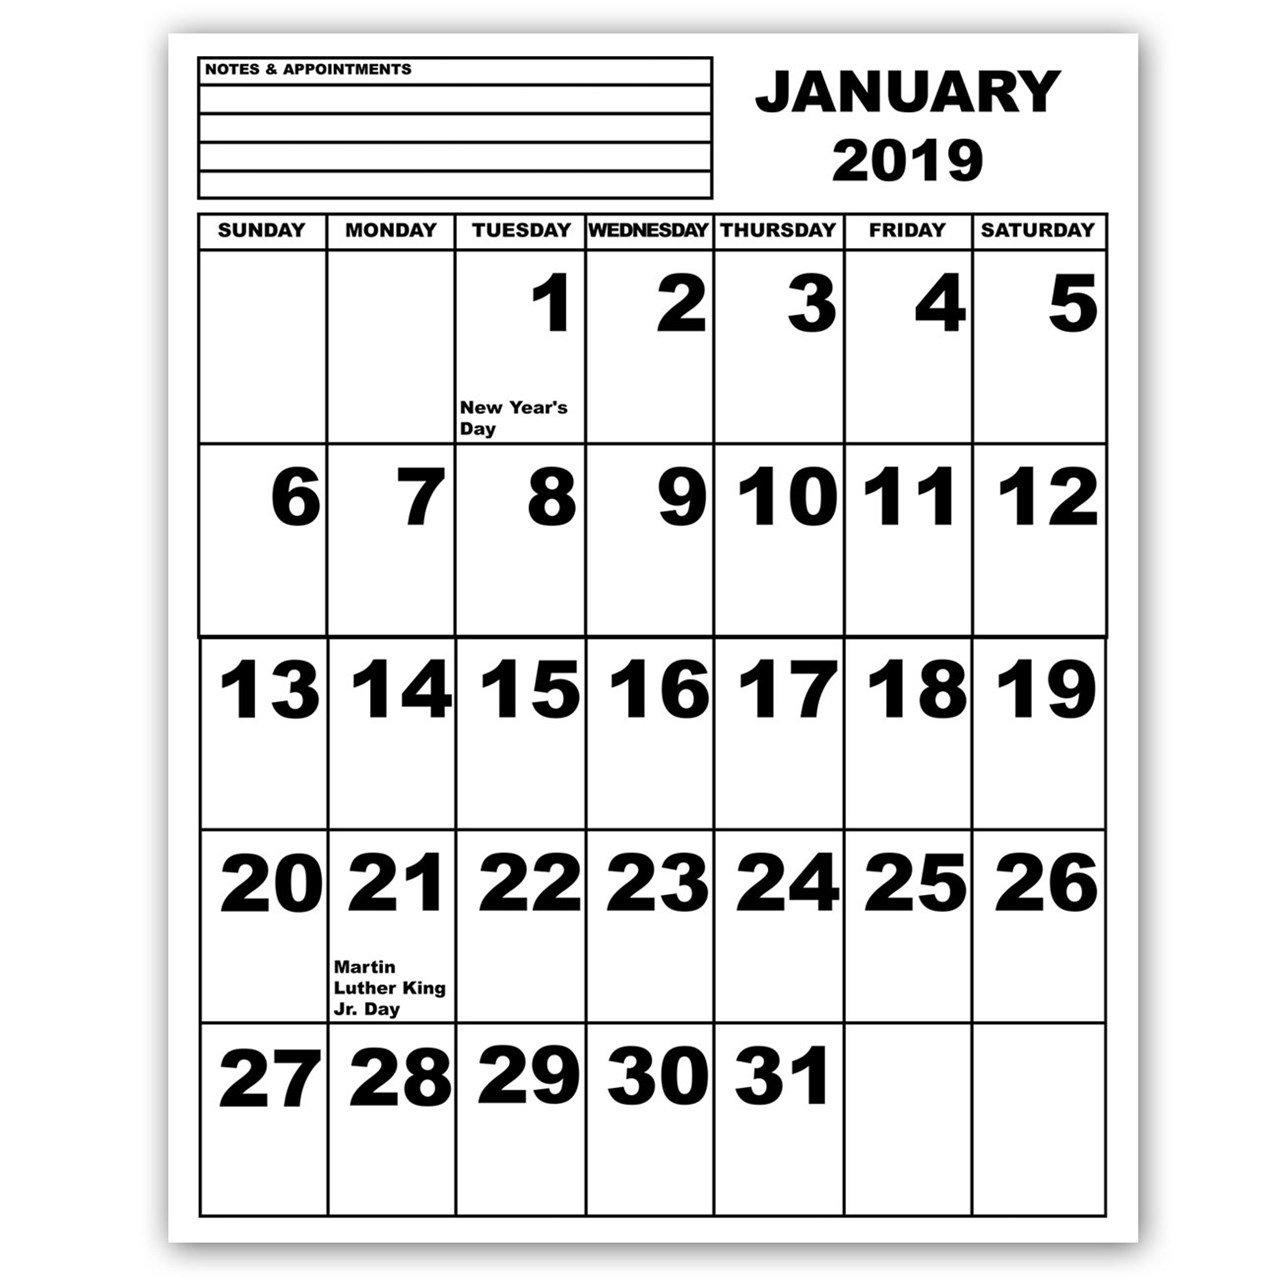 Maxiaids | Jumbo Print Calendar – 2019 Calendar 2019 For Print